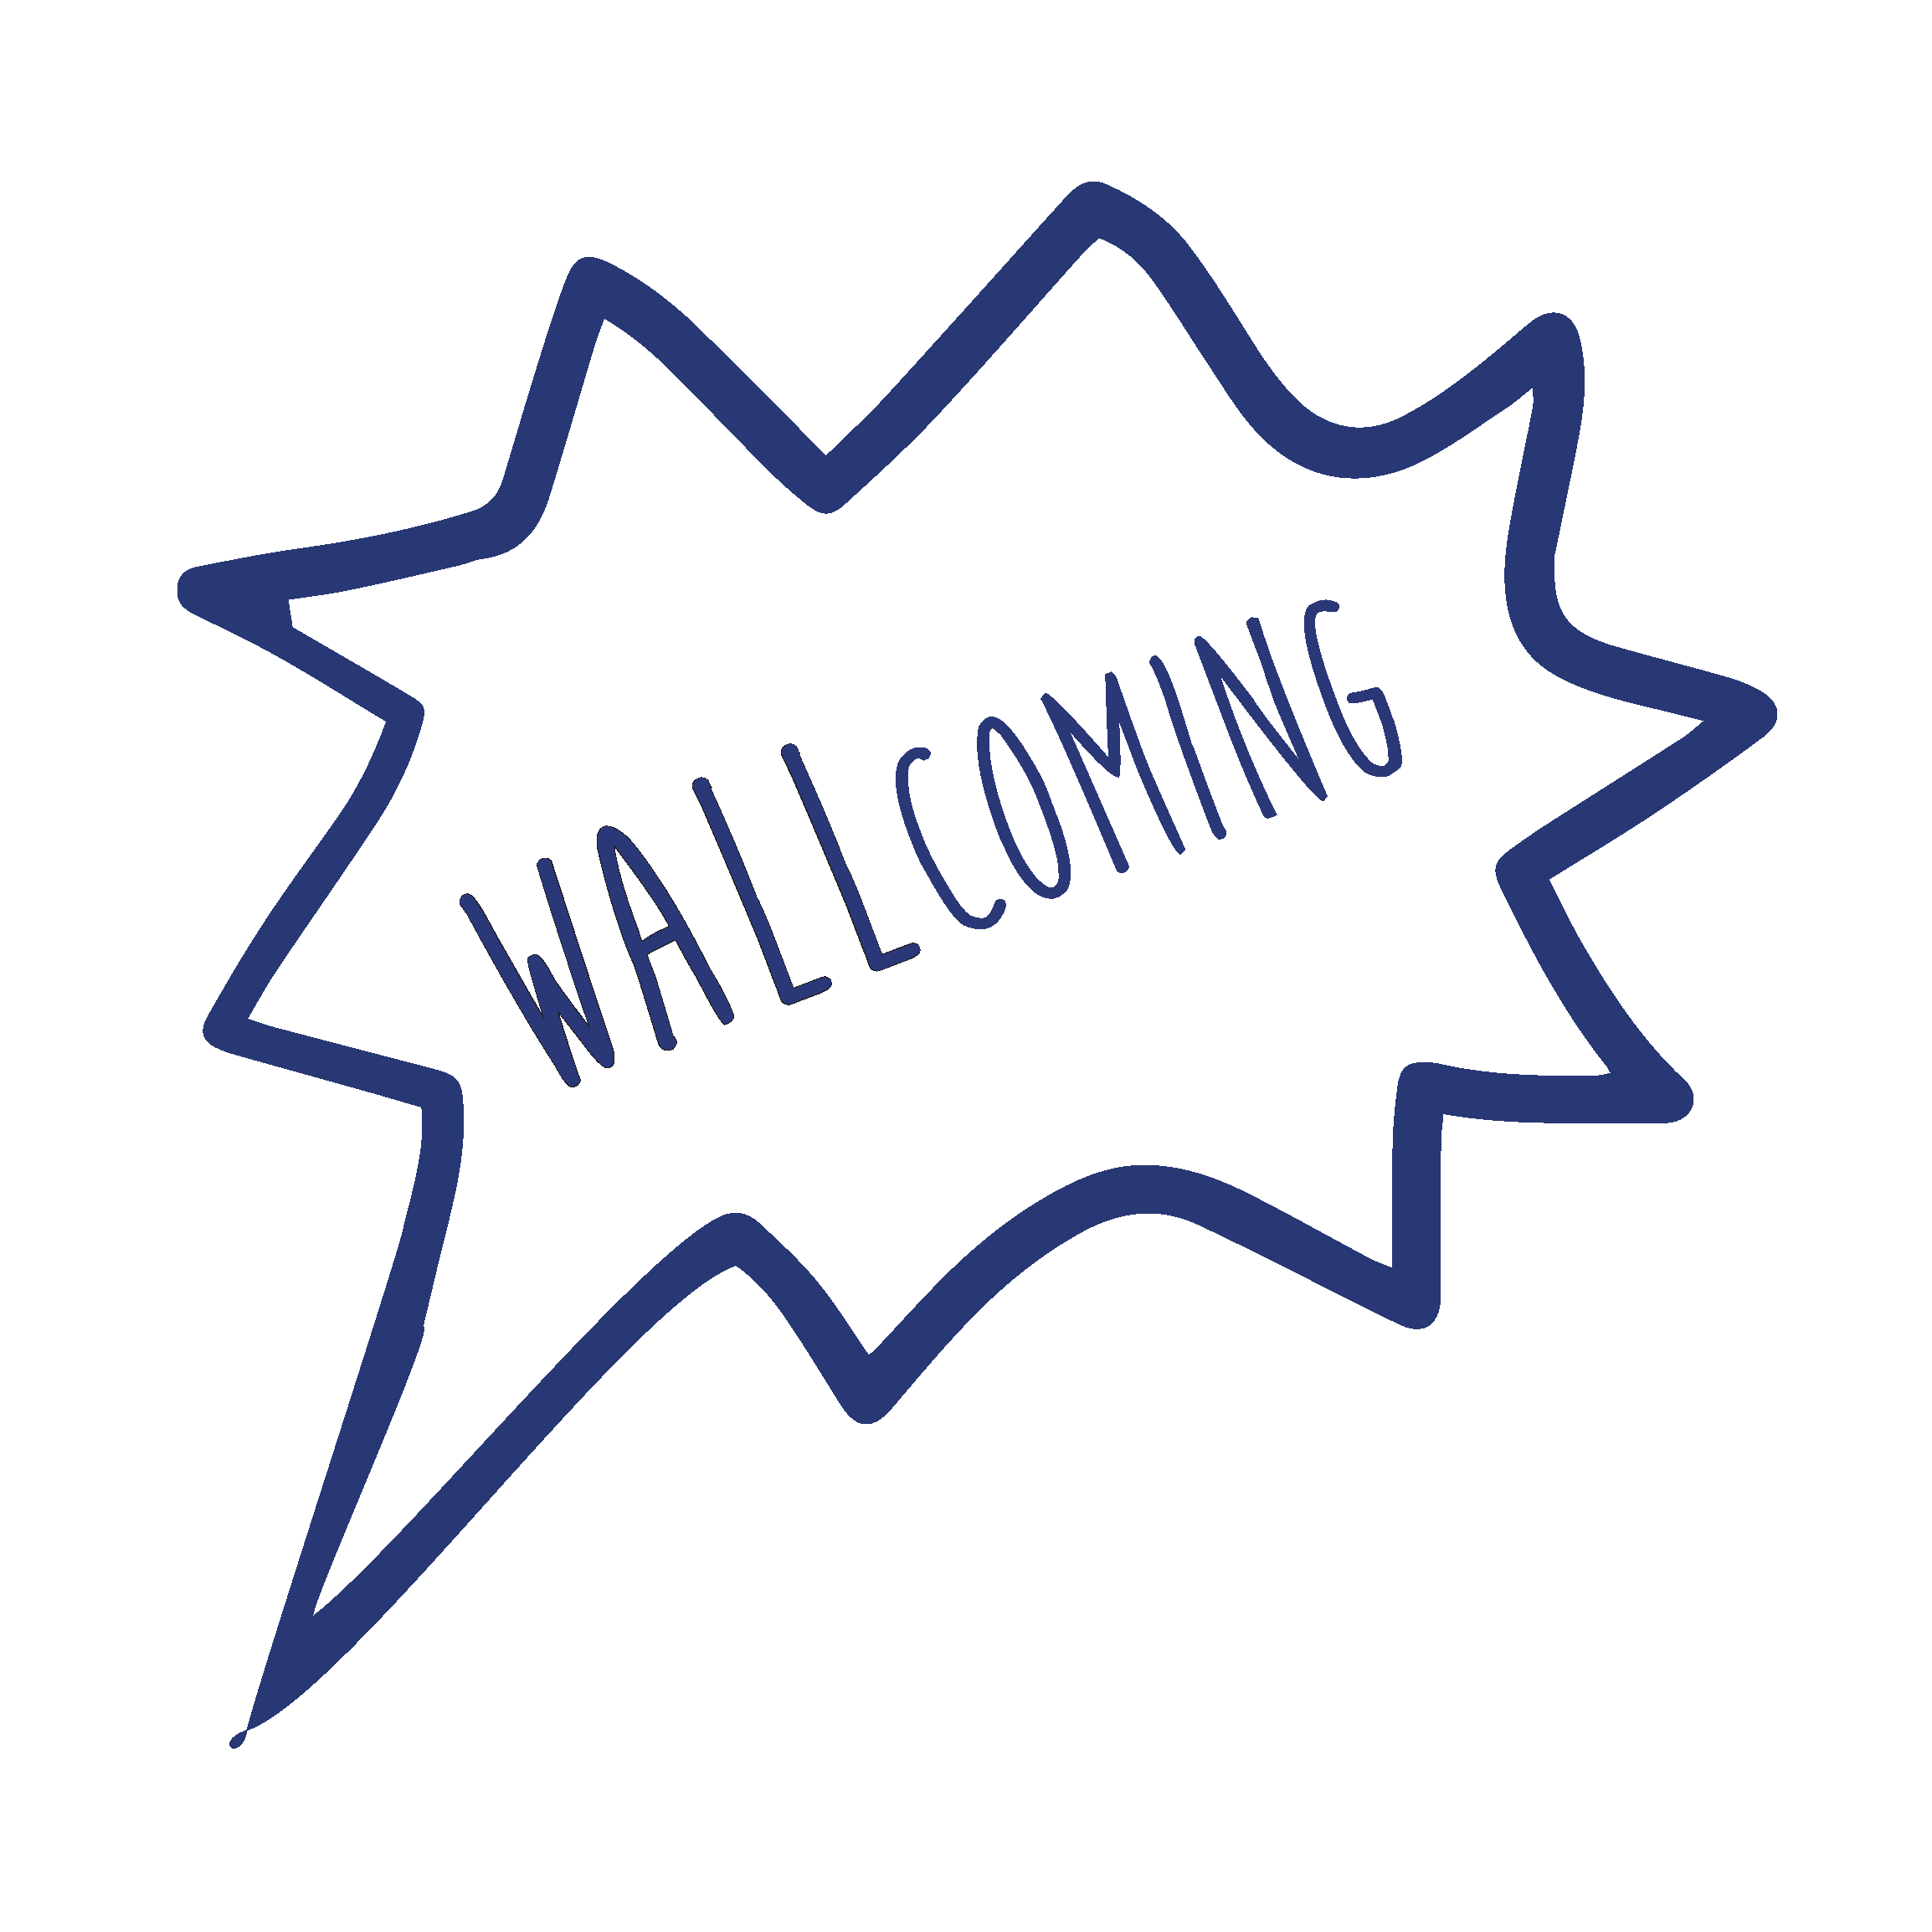 Wallcoming